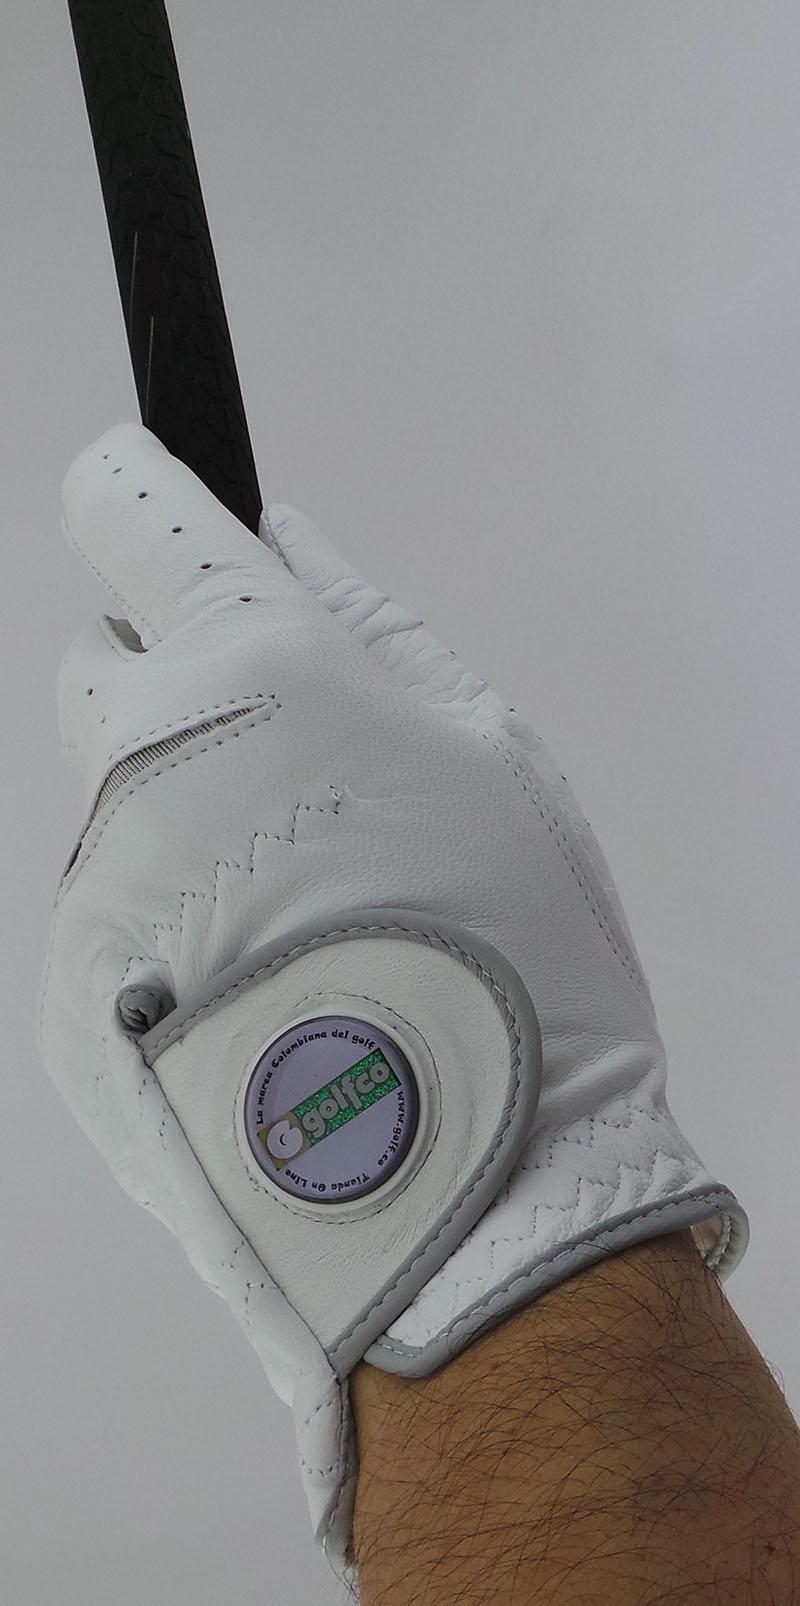 guante de golf marca golfco blanco 05